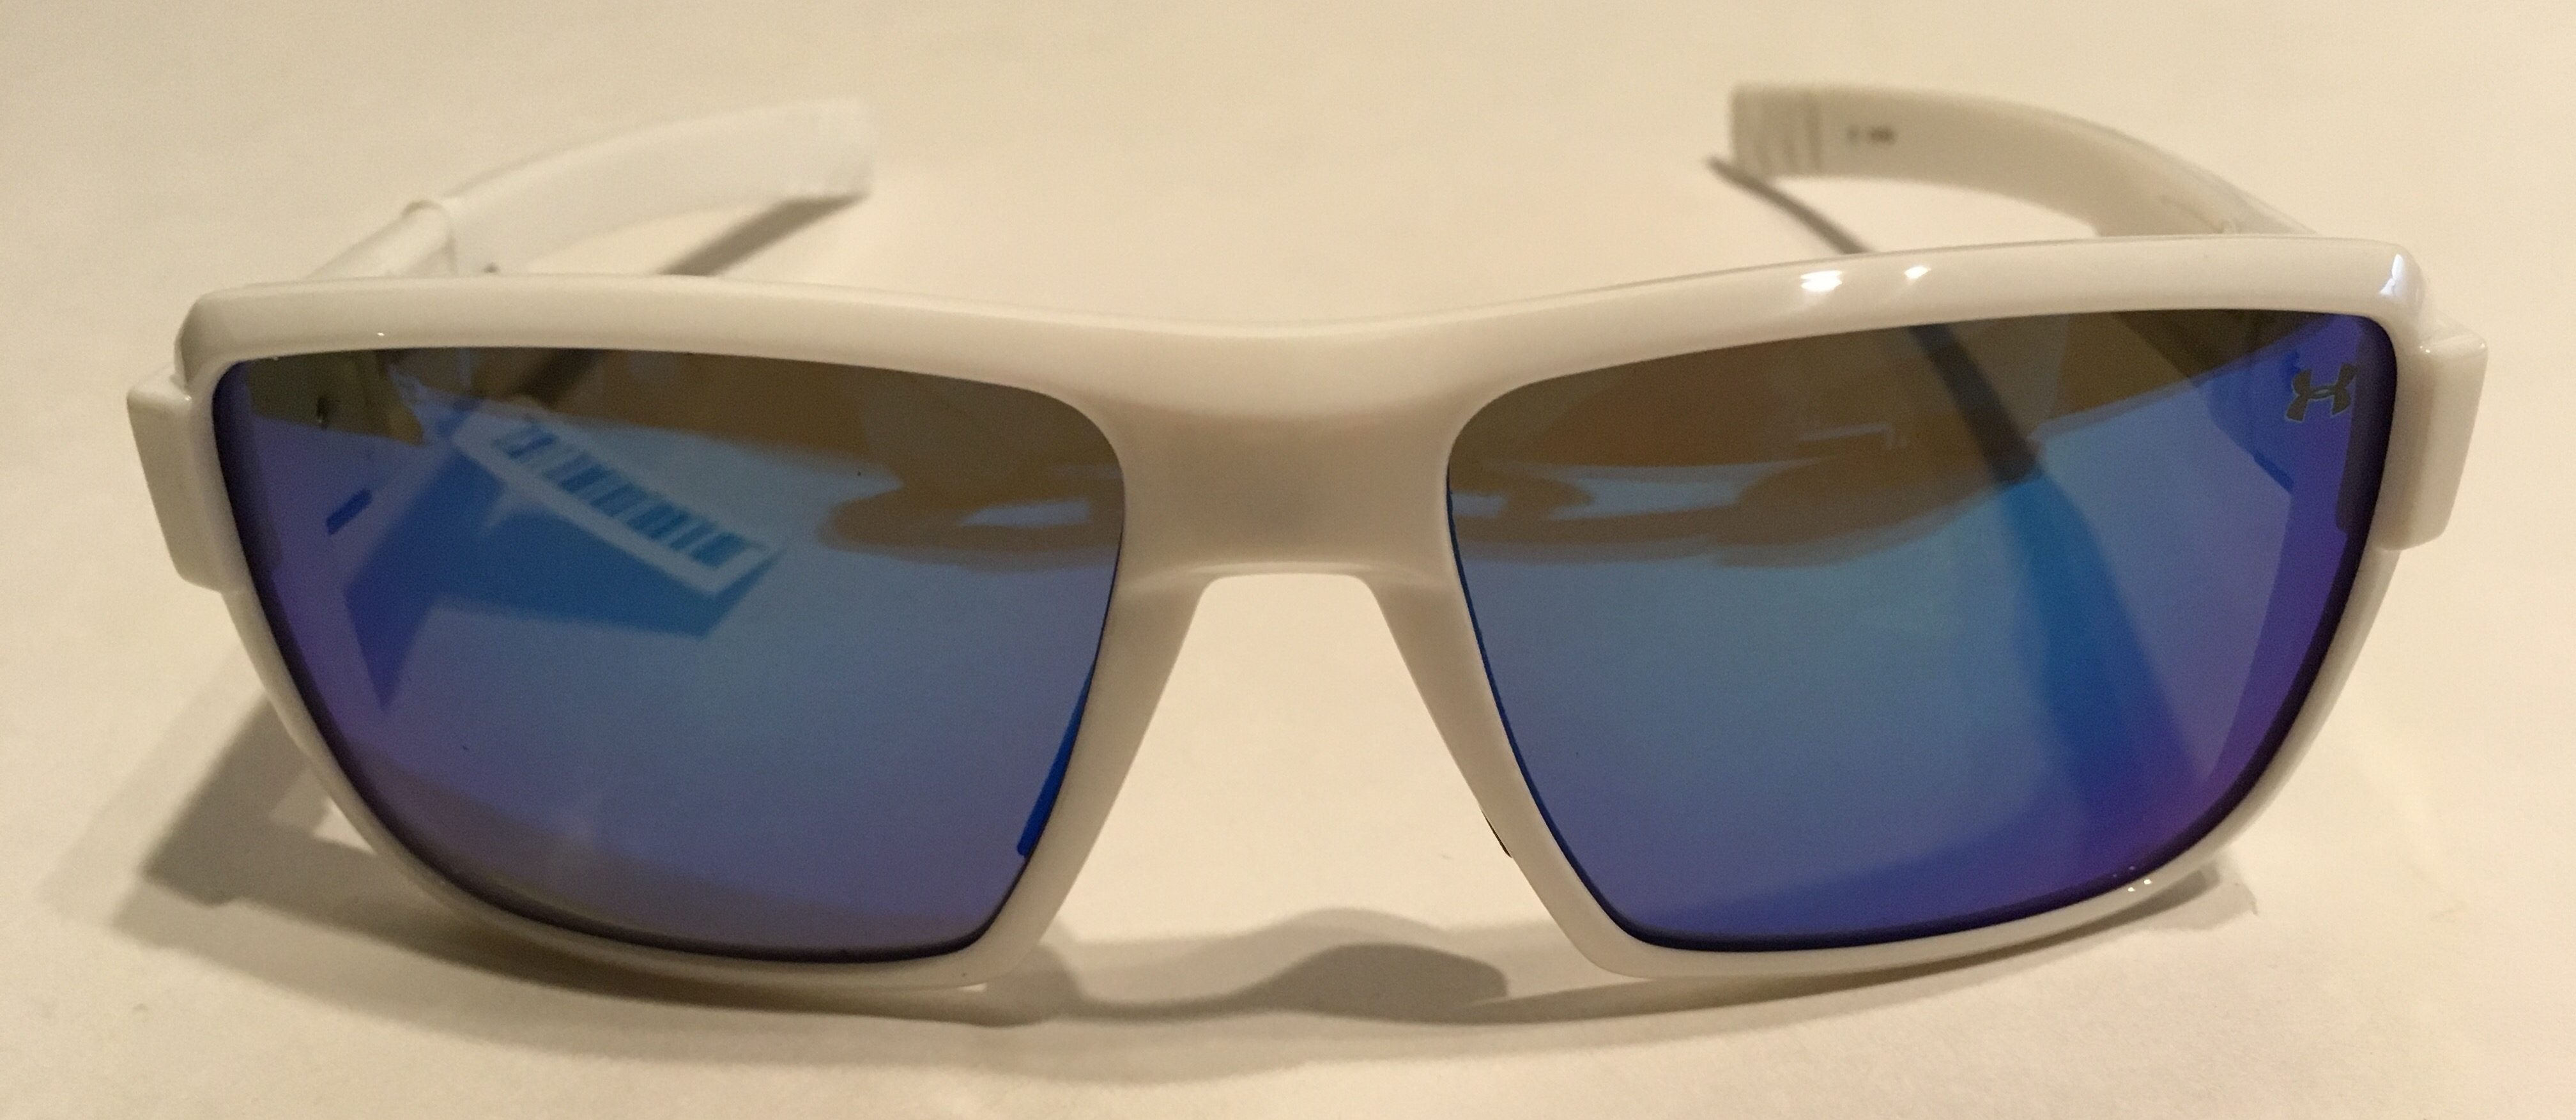 b4dfad01f2a Under Armour Recon Sunglasses UA - Shiny White - Blue Multiflection